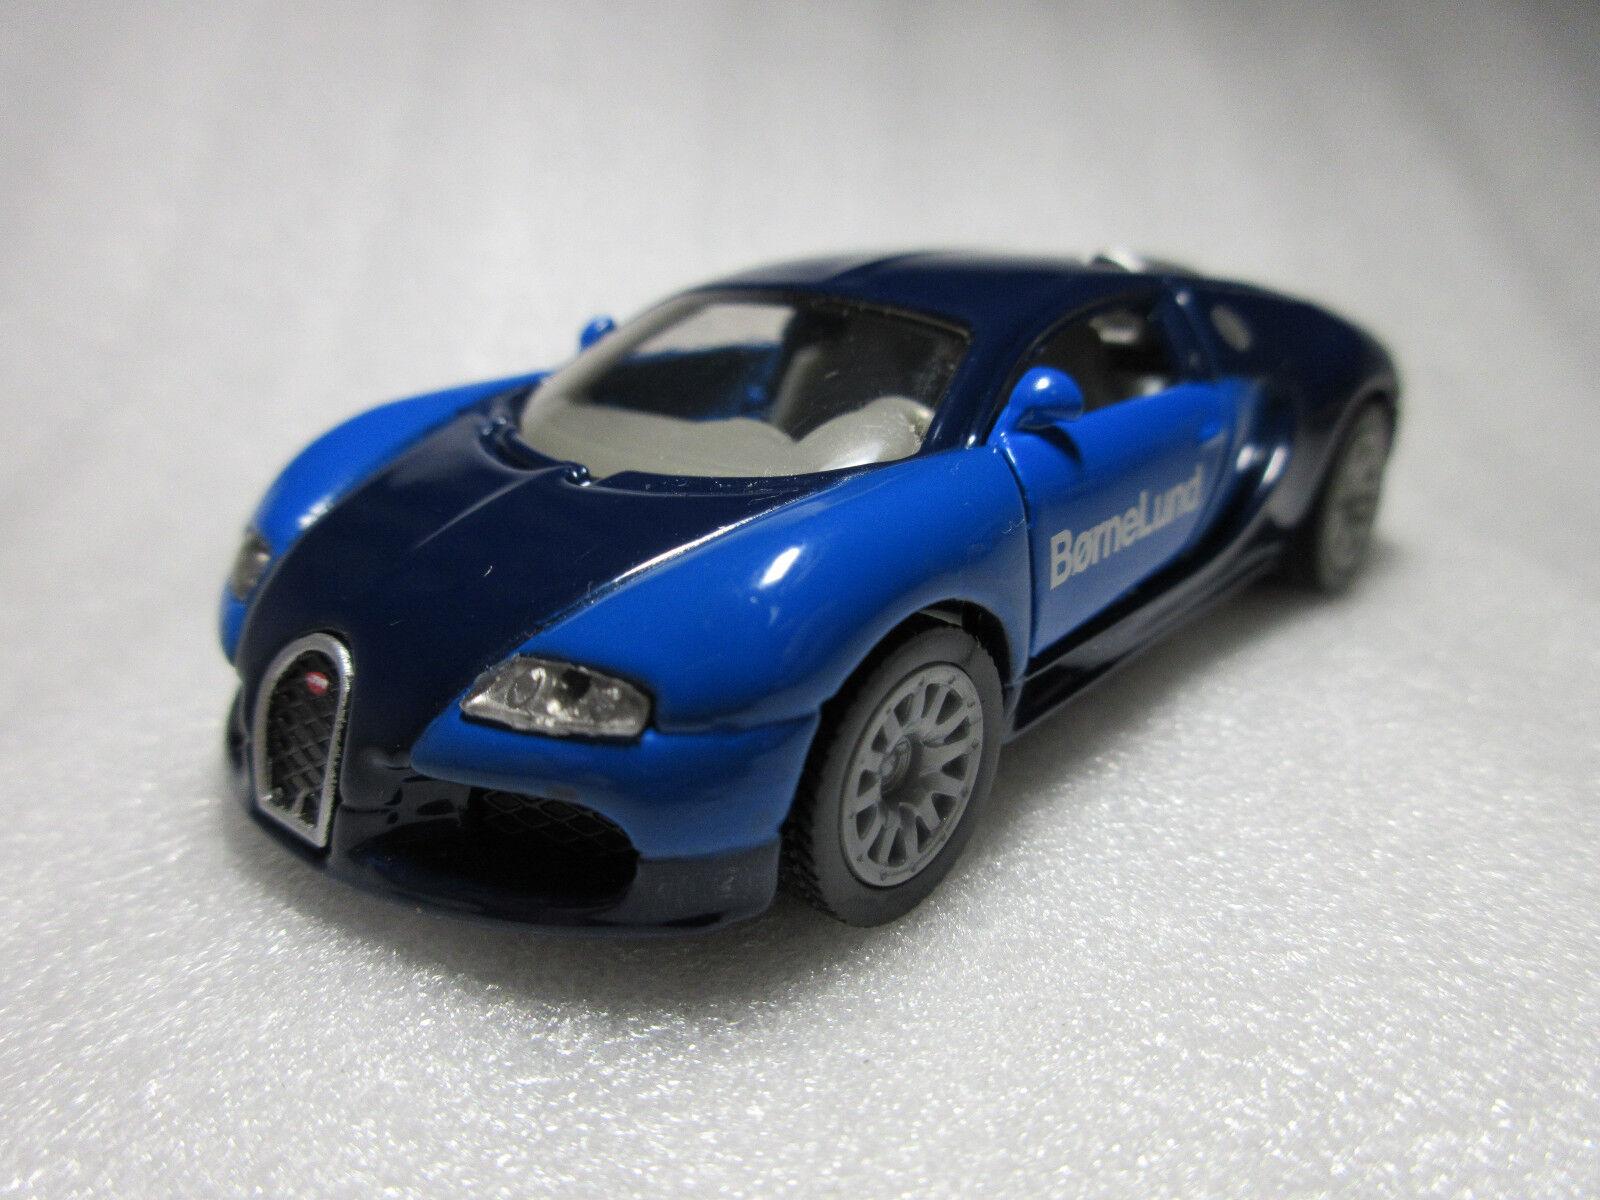 SIKU Bugatti Veyron Bornelund 2006 Exclusive Diecast Model Rare Promo NIB